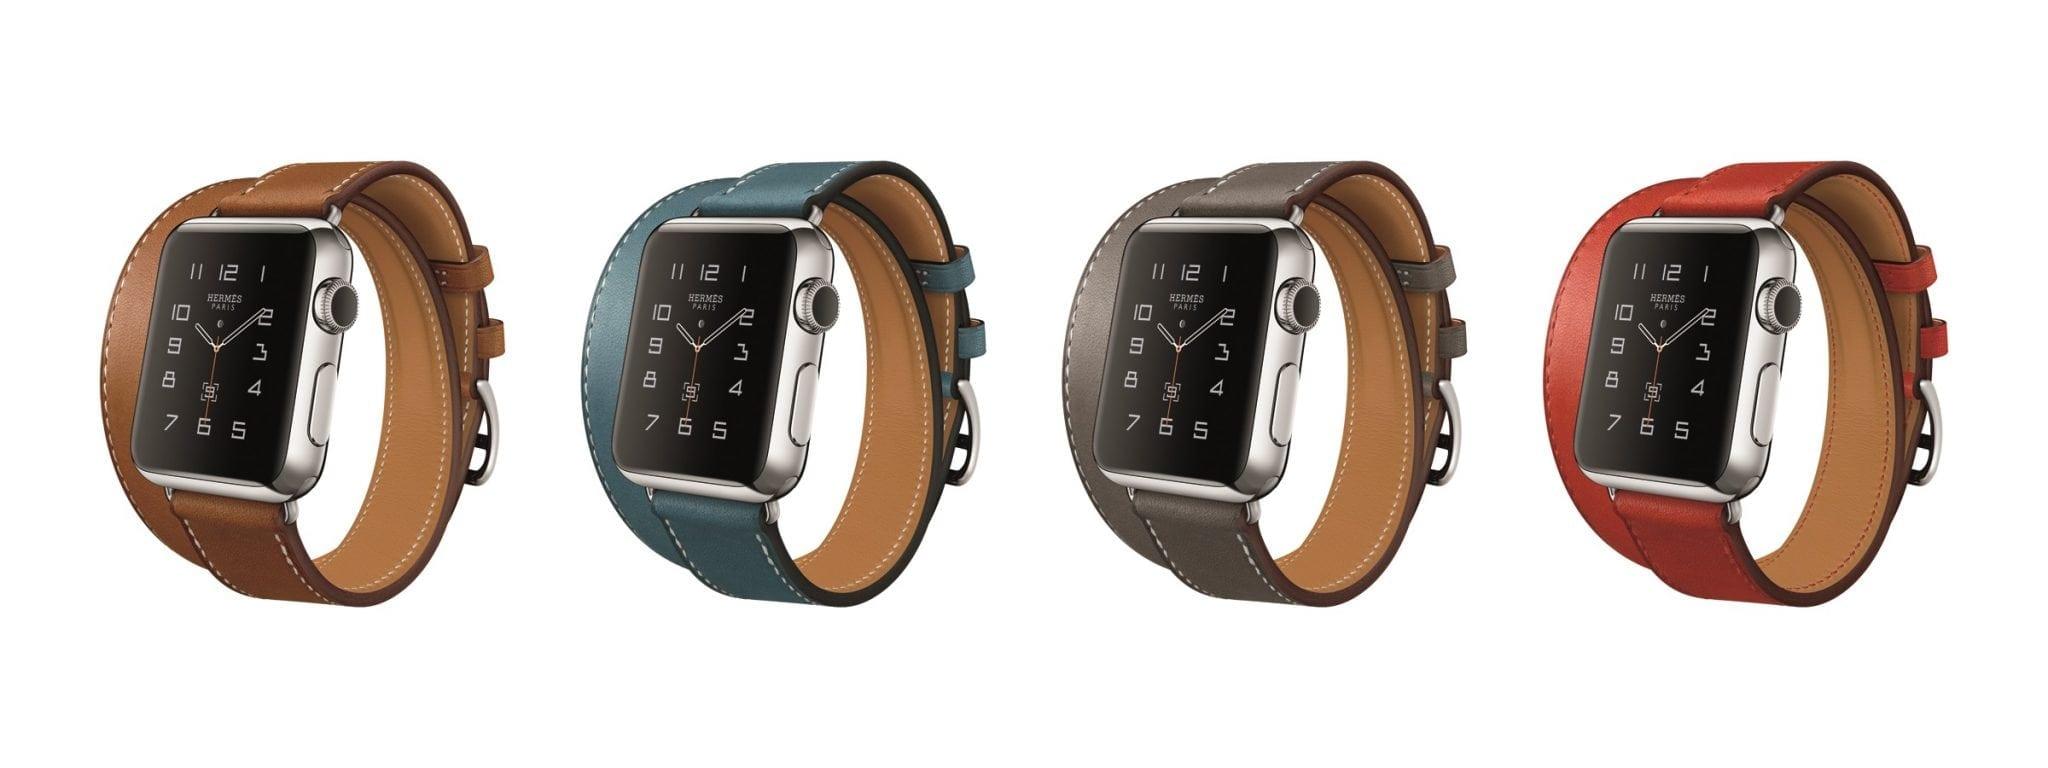 Apple Watch Hermès, un smartwatch galant